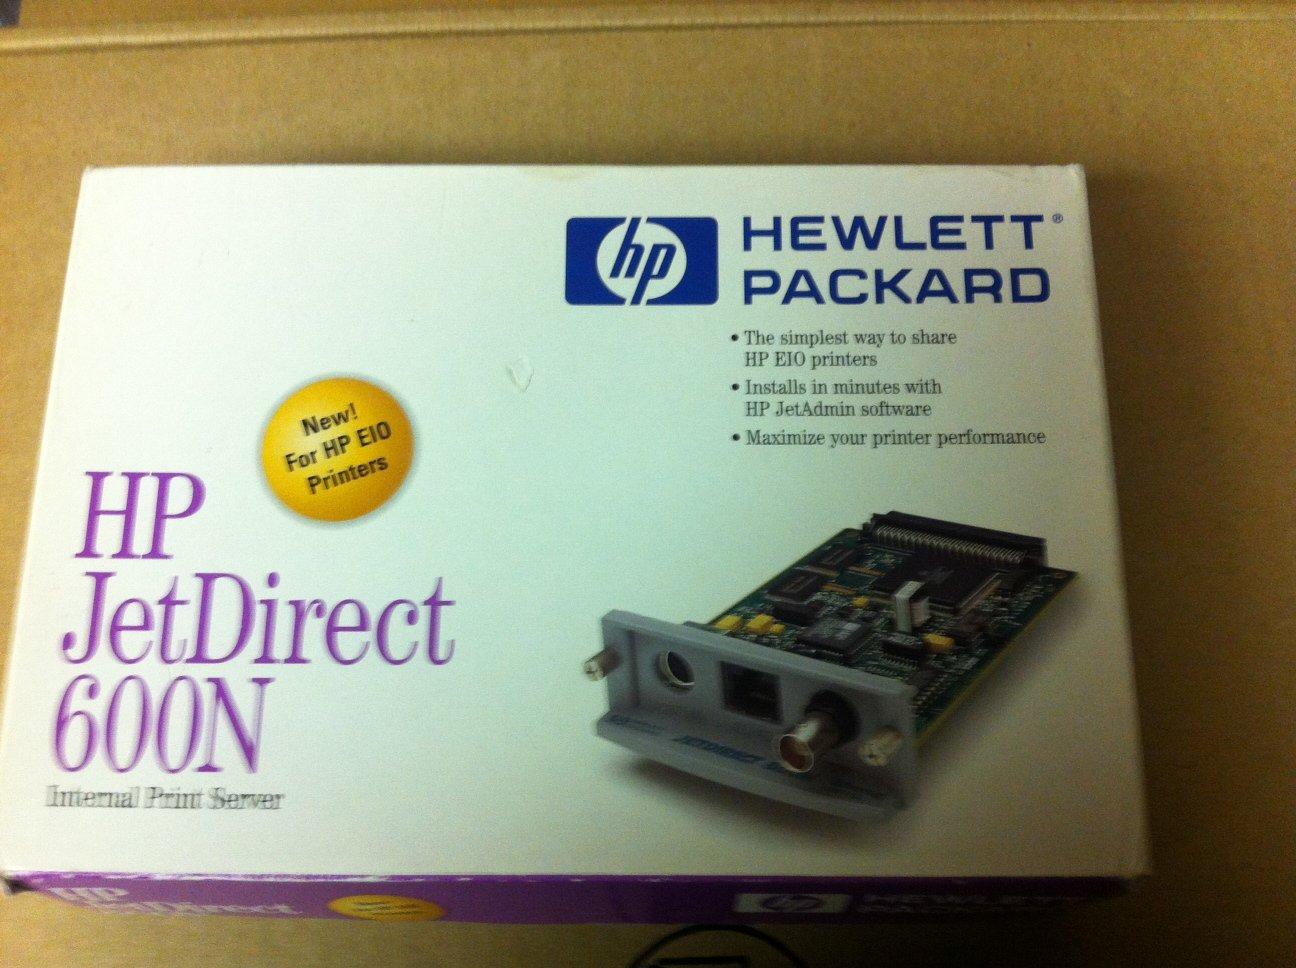 Color printing uw - Amazon Com Hp Jetdirect 600n J3111a J3111 Eio Print Server Nic Card Electronics